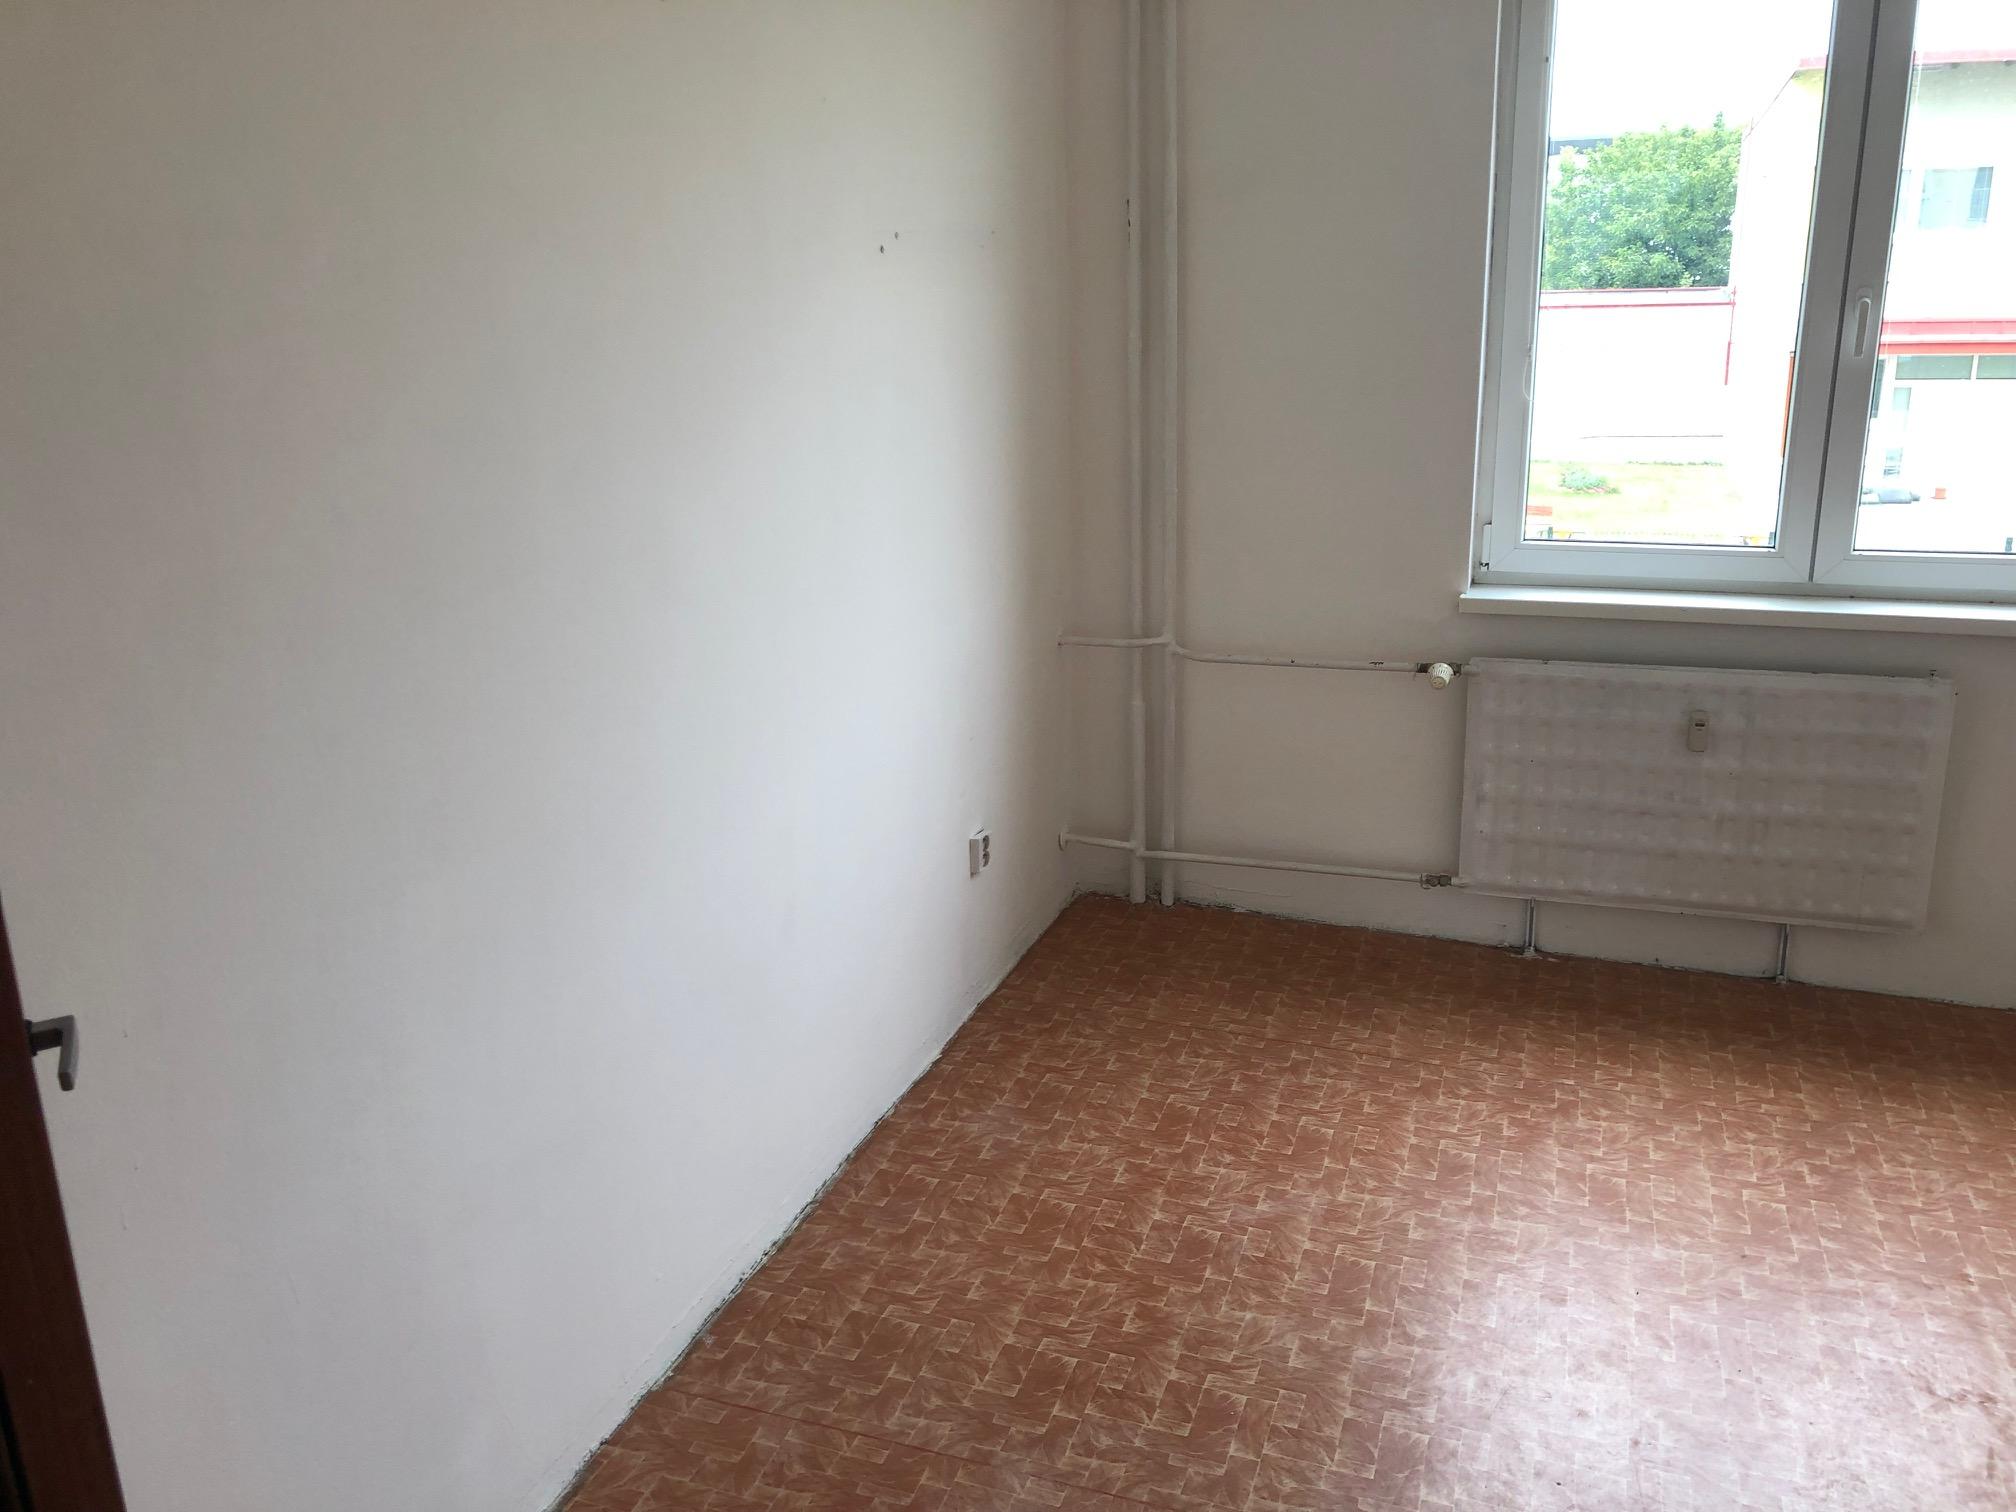 2 izbový byt, 52m2, pivnica, pôvodný stav, Skuteckého, Malacky Juh-21